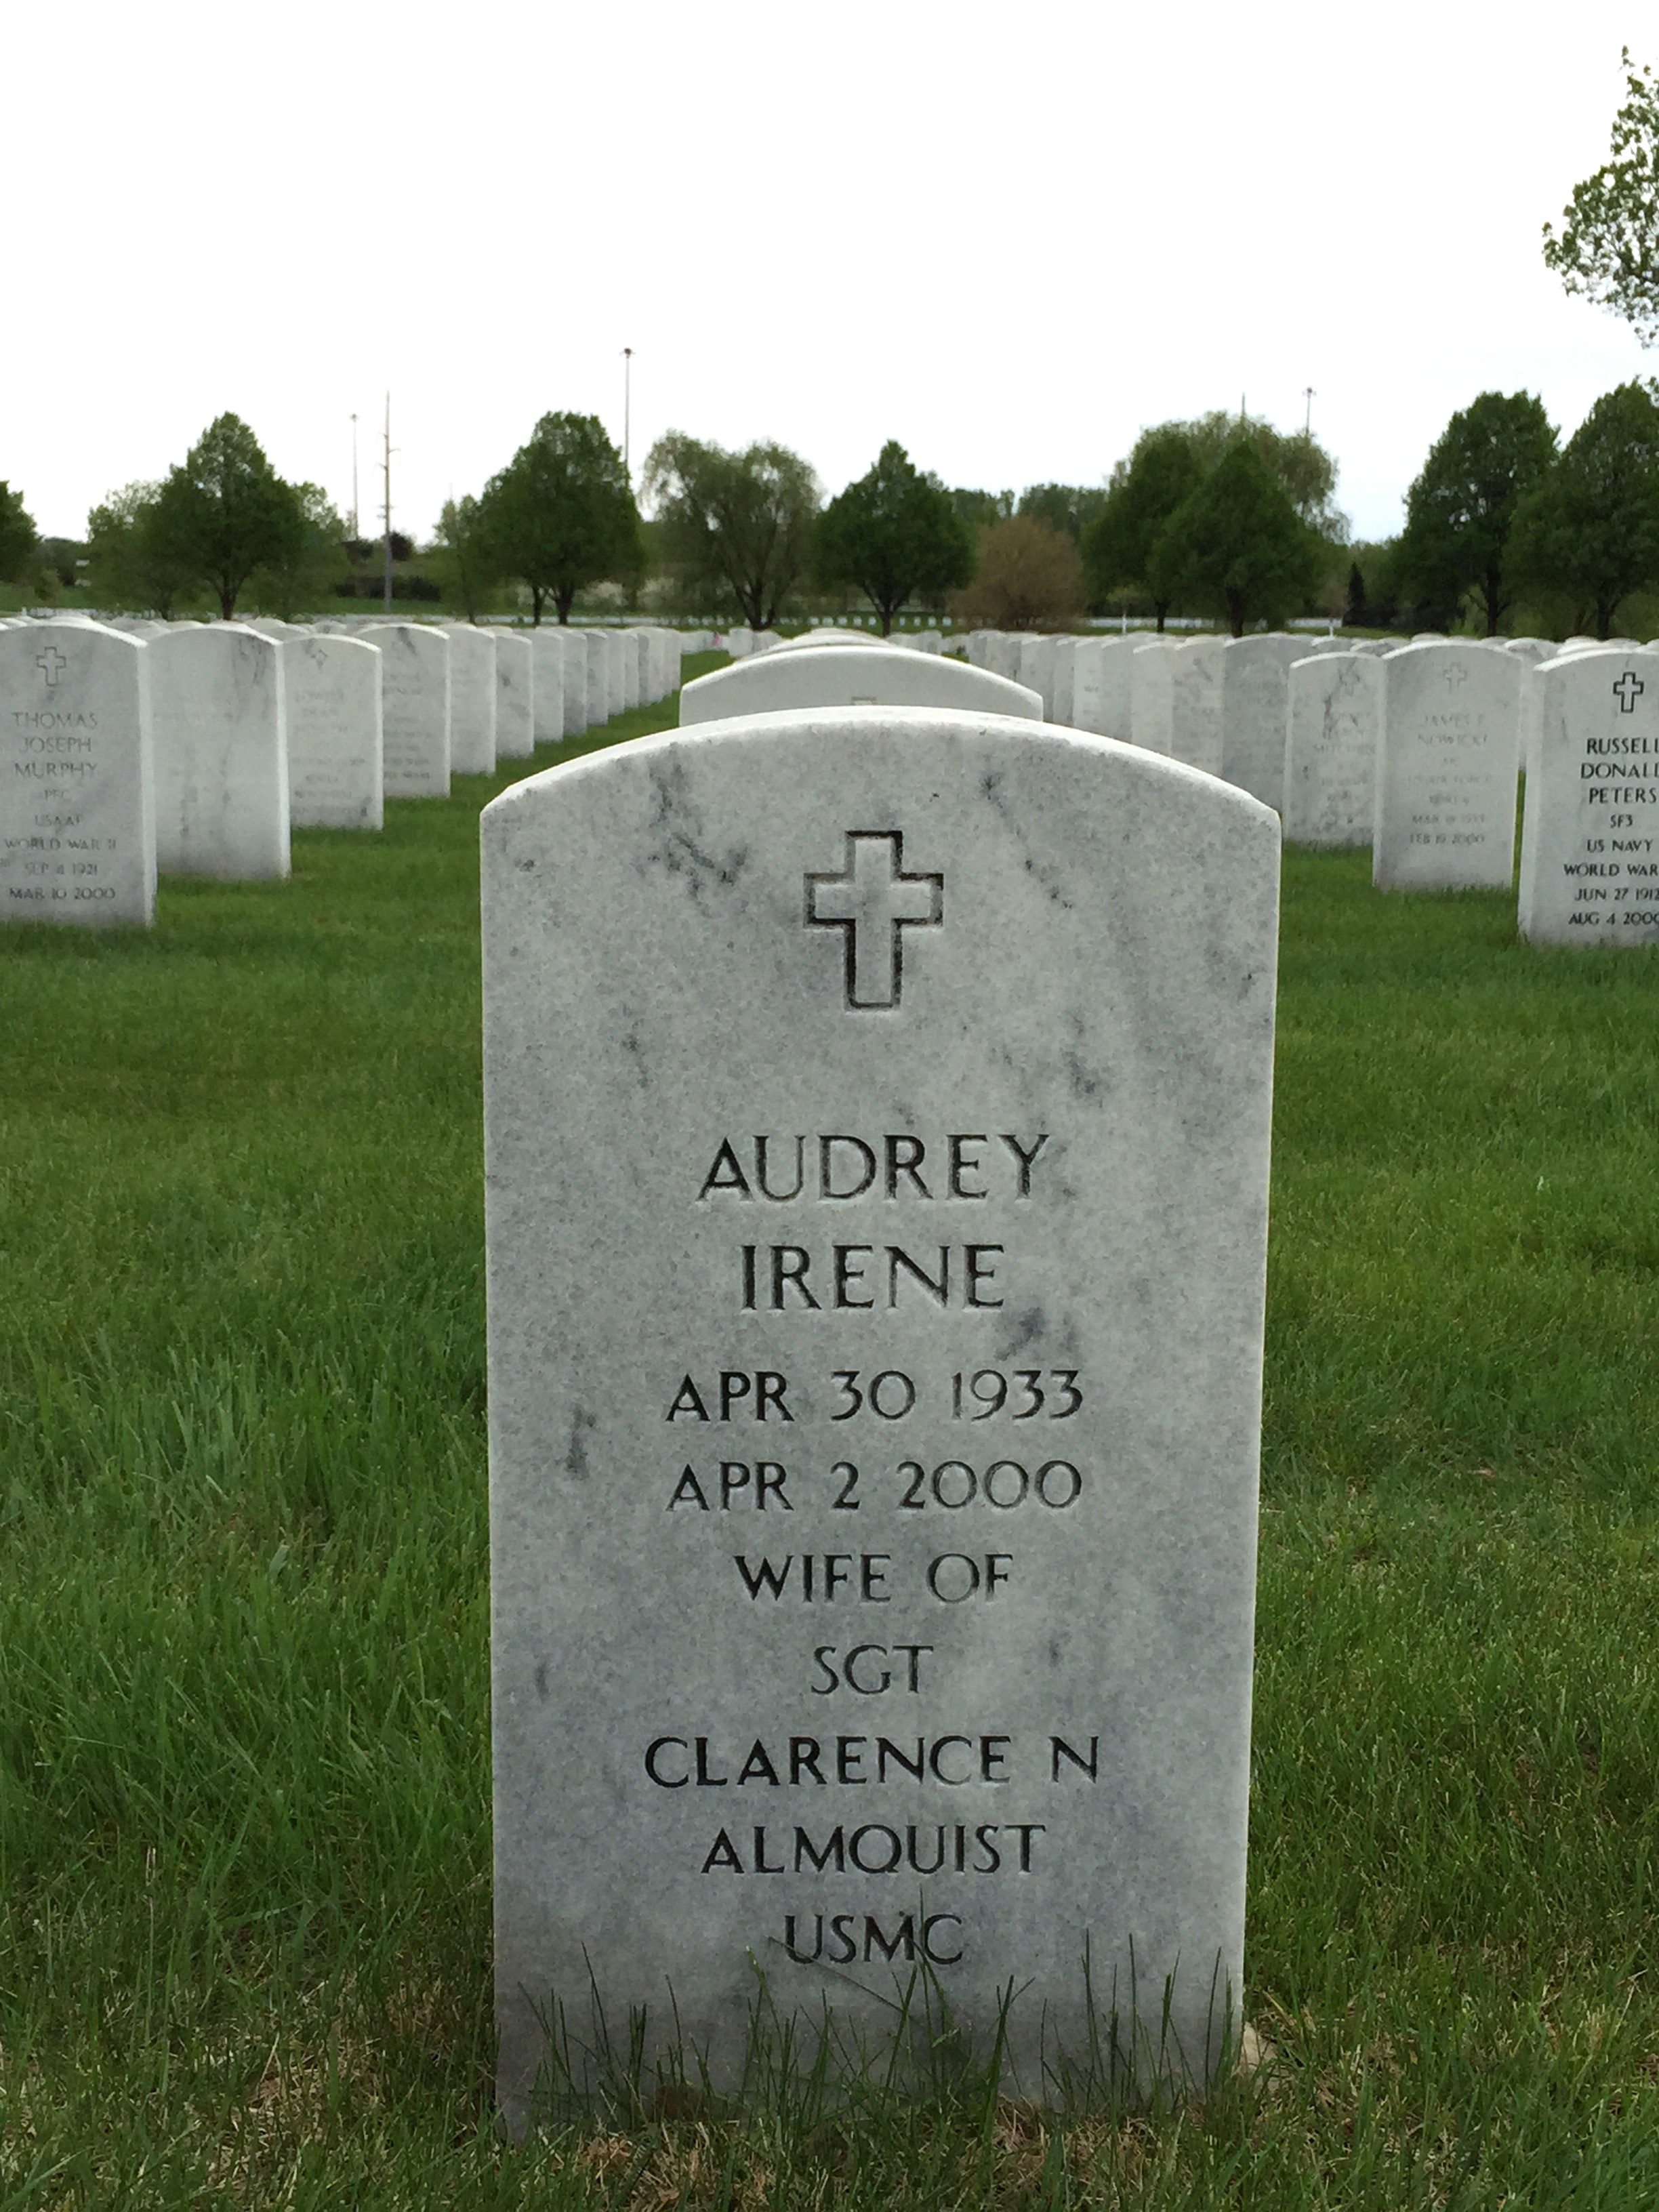 Audrey Irene Almquist